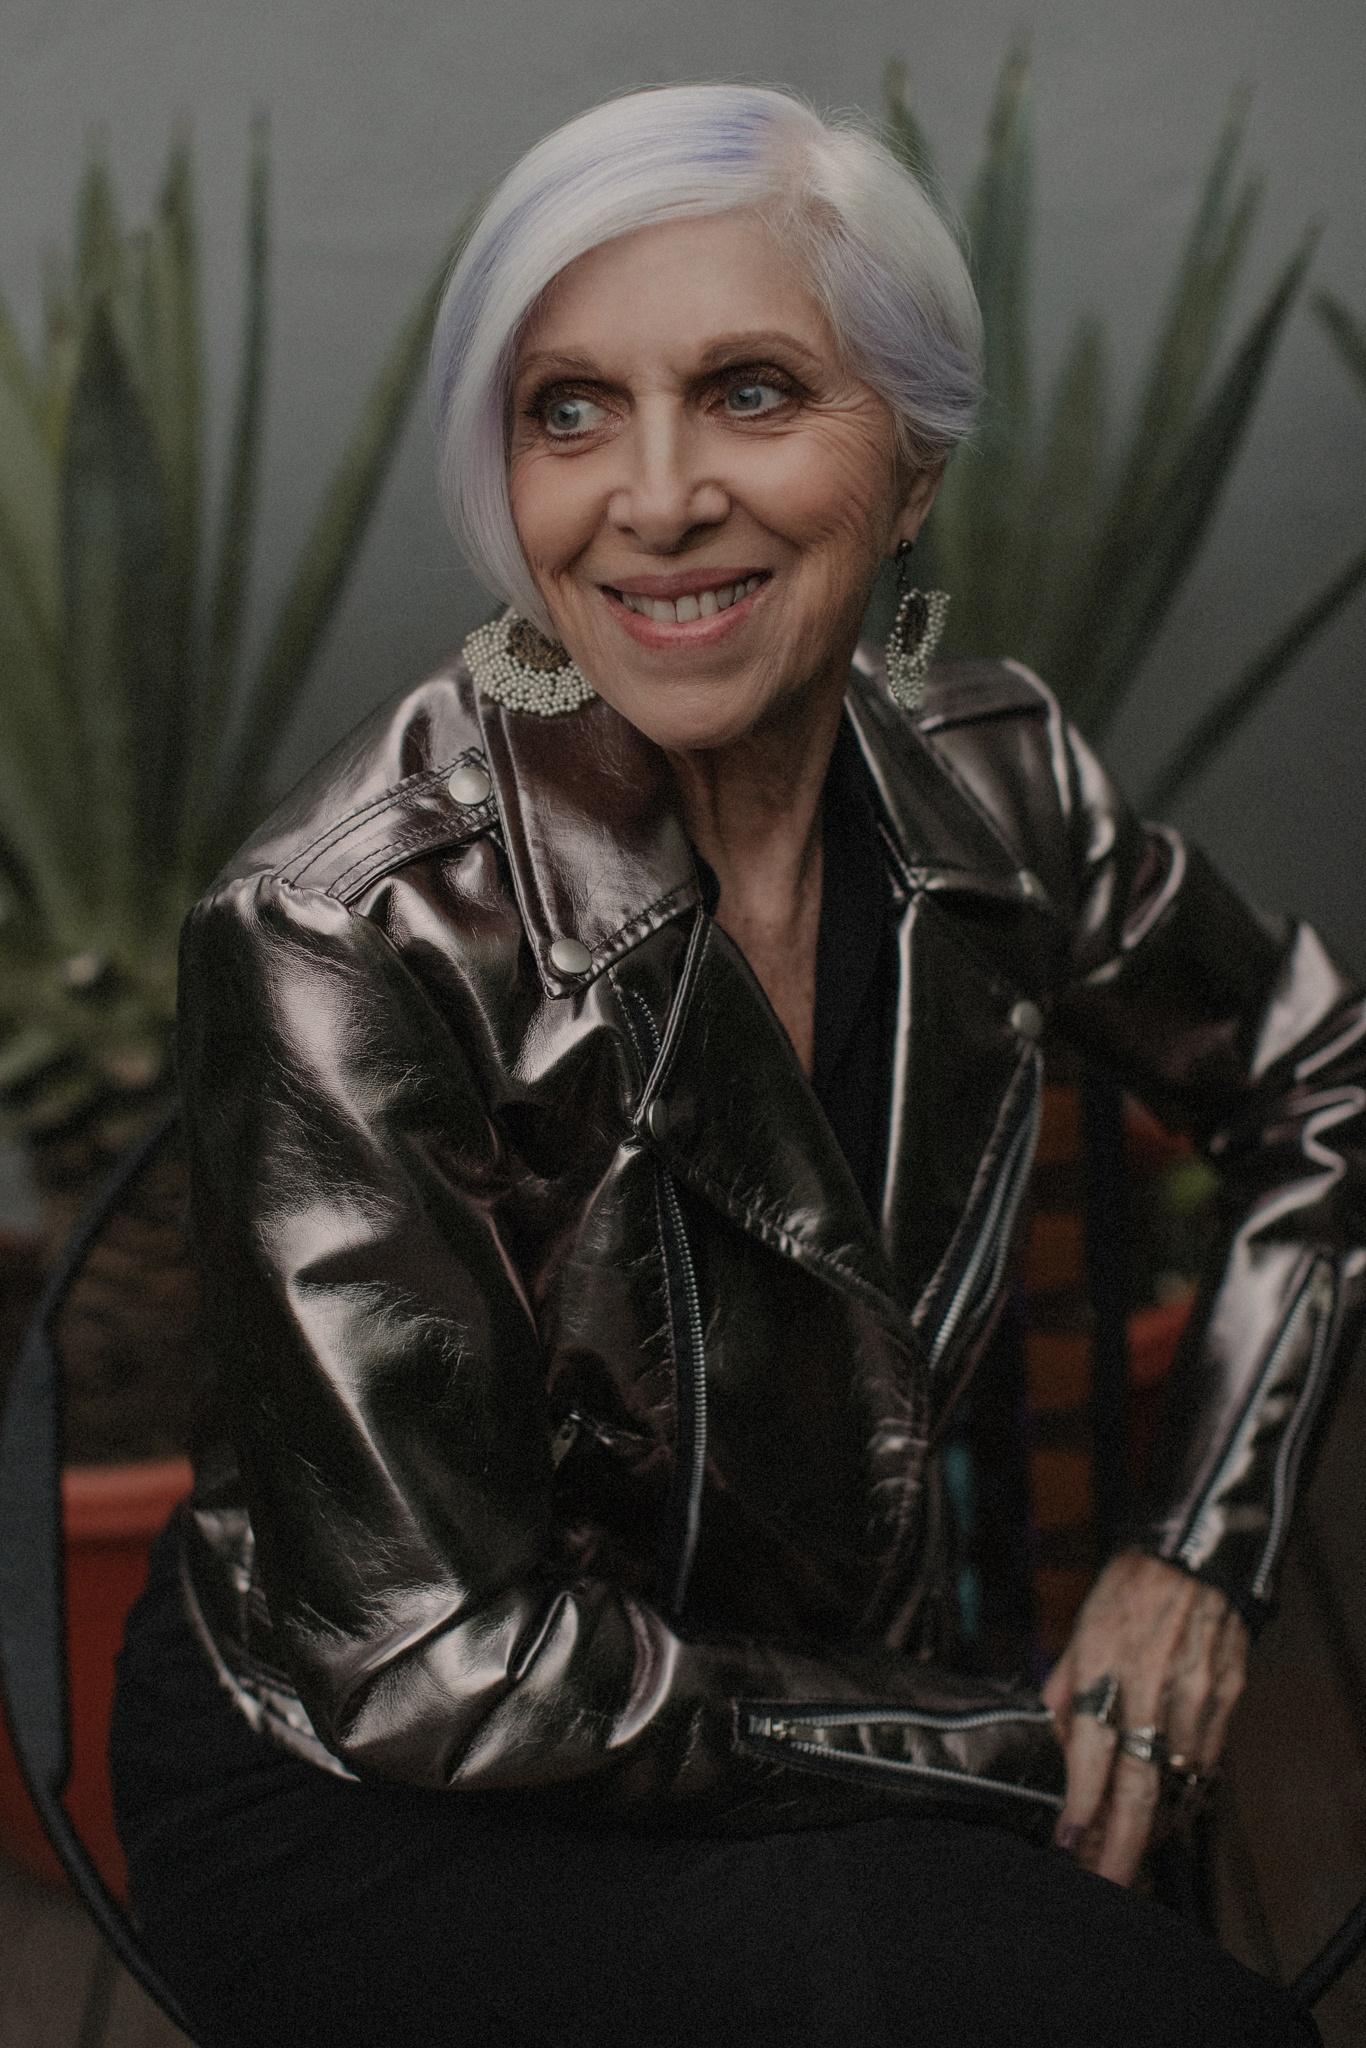 Anna Fusoni - una vida dedicada a la moda